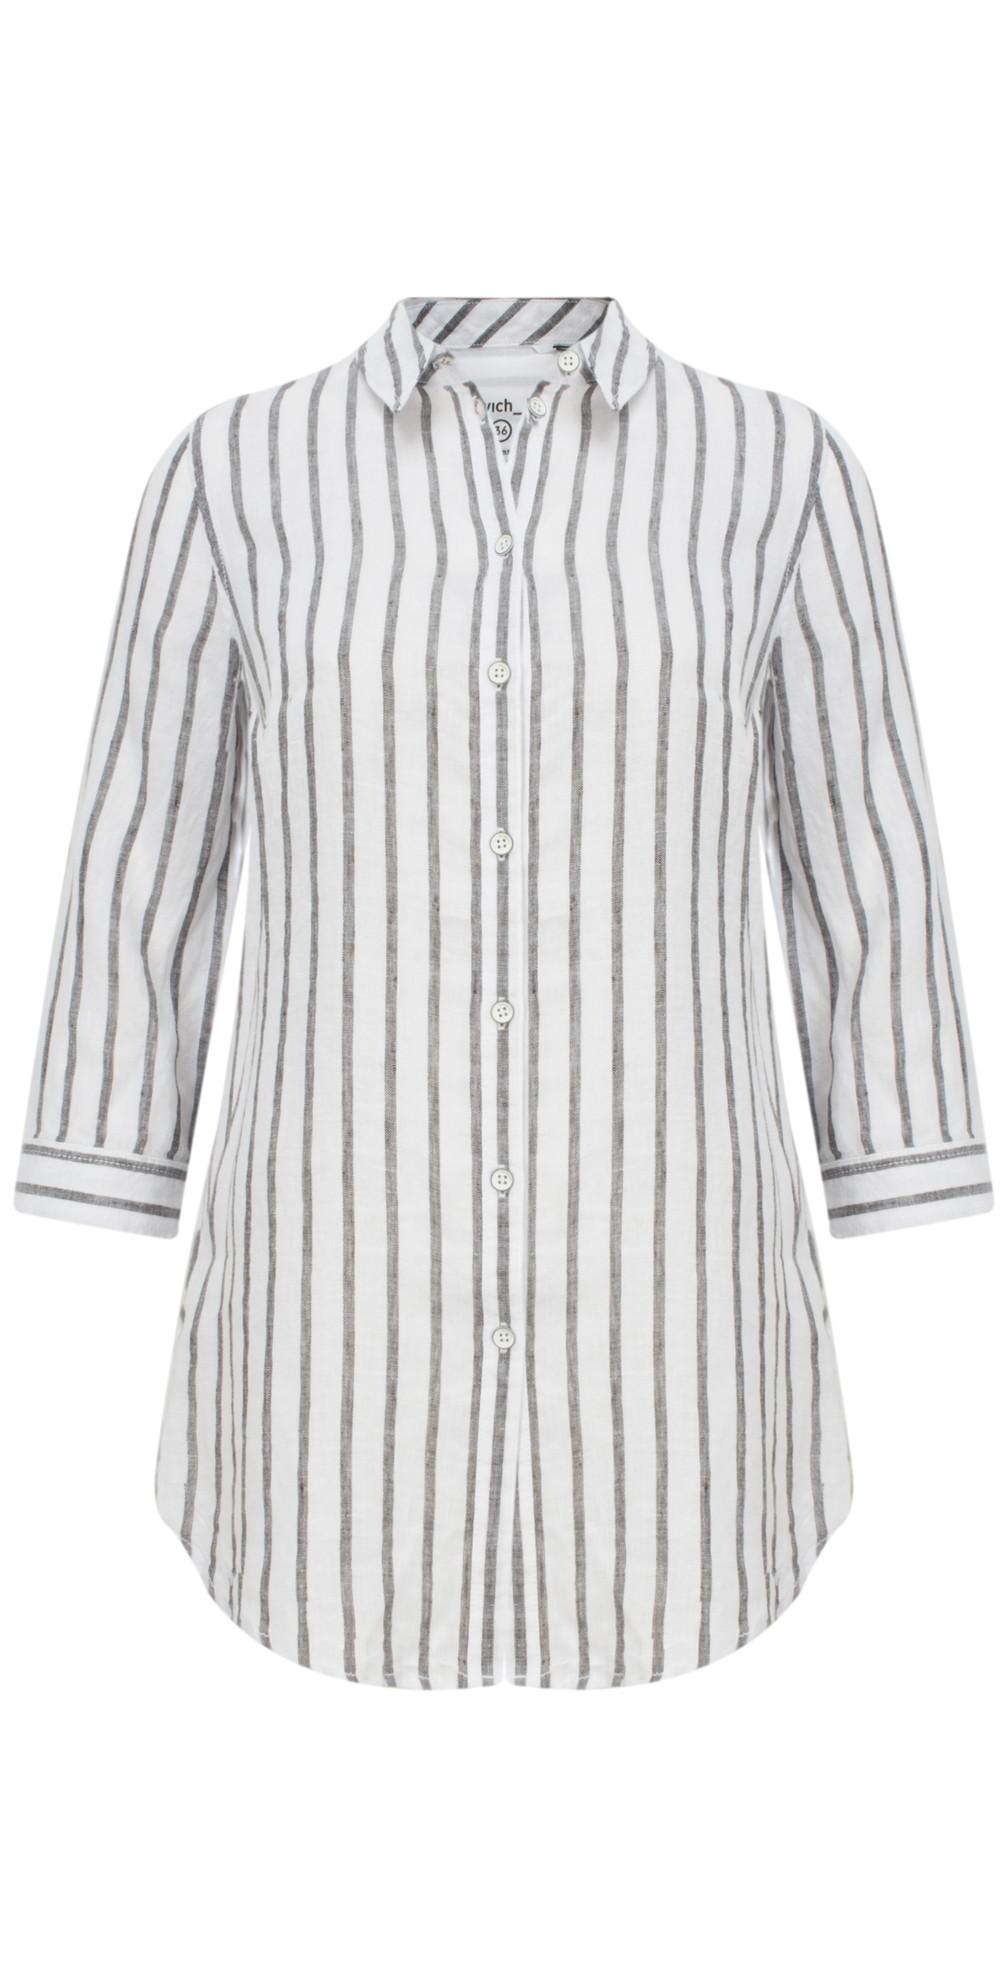 Linen Striped Shirt main image